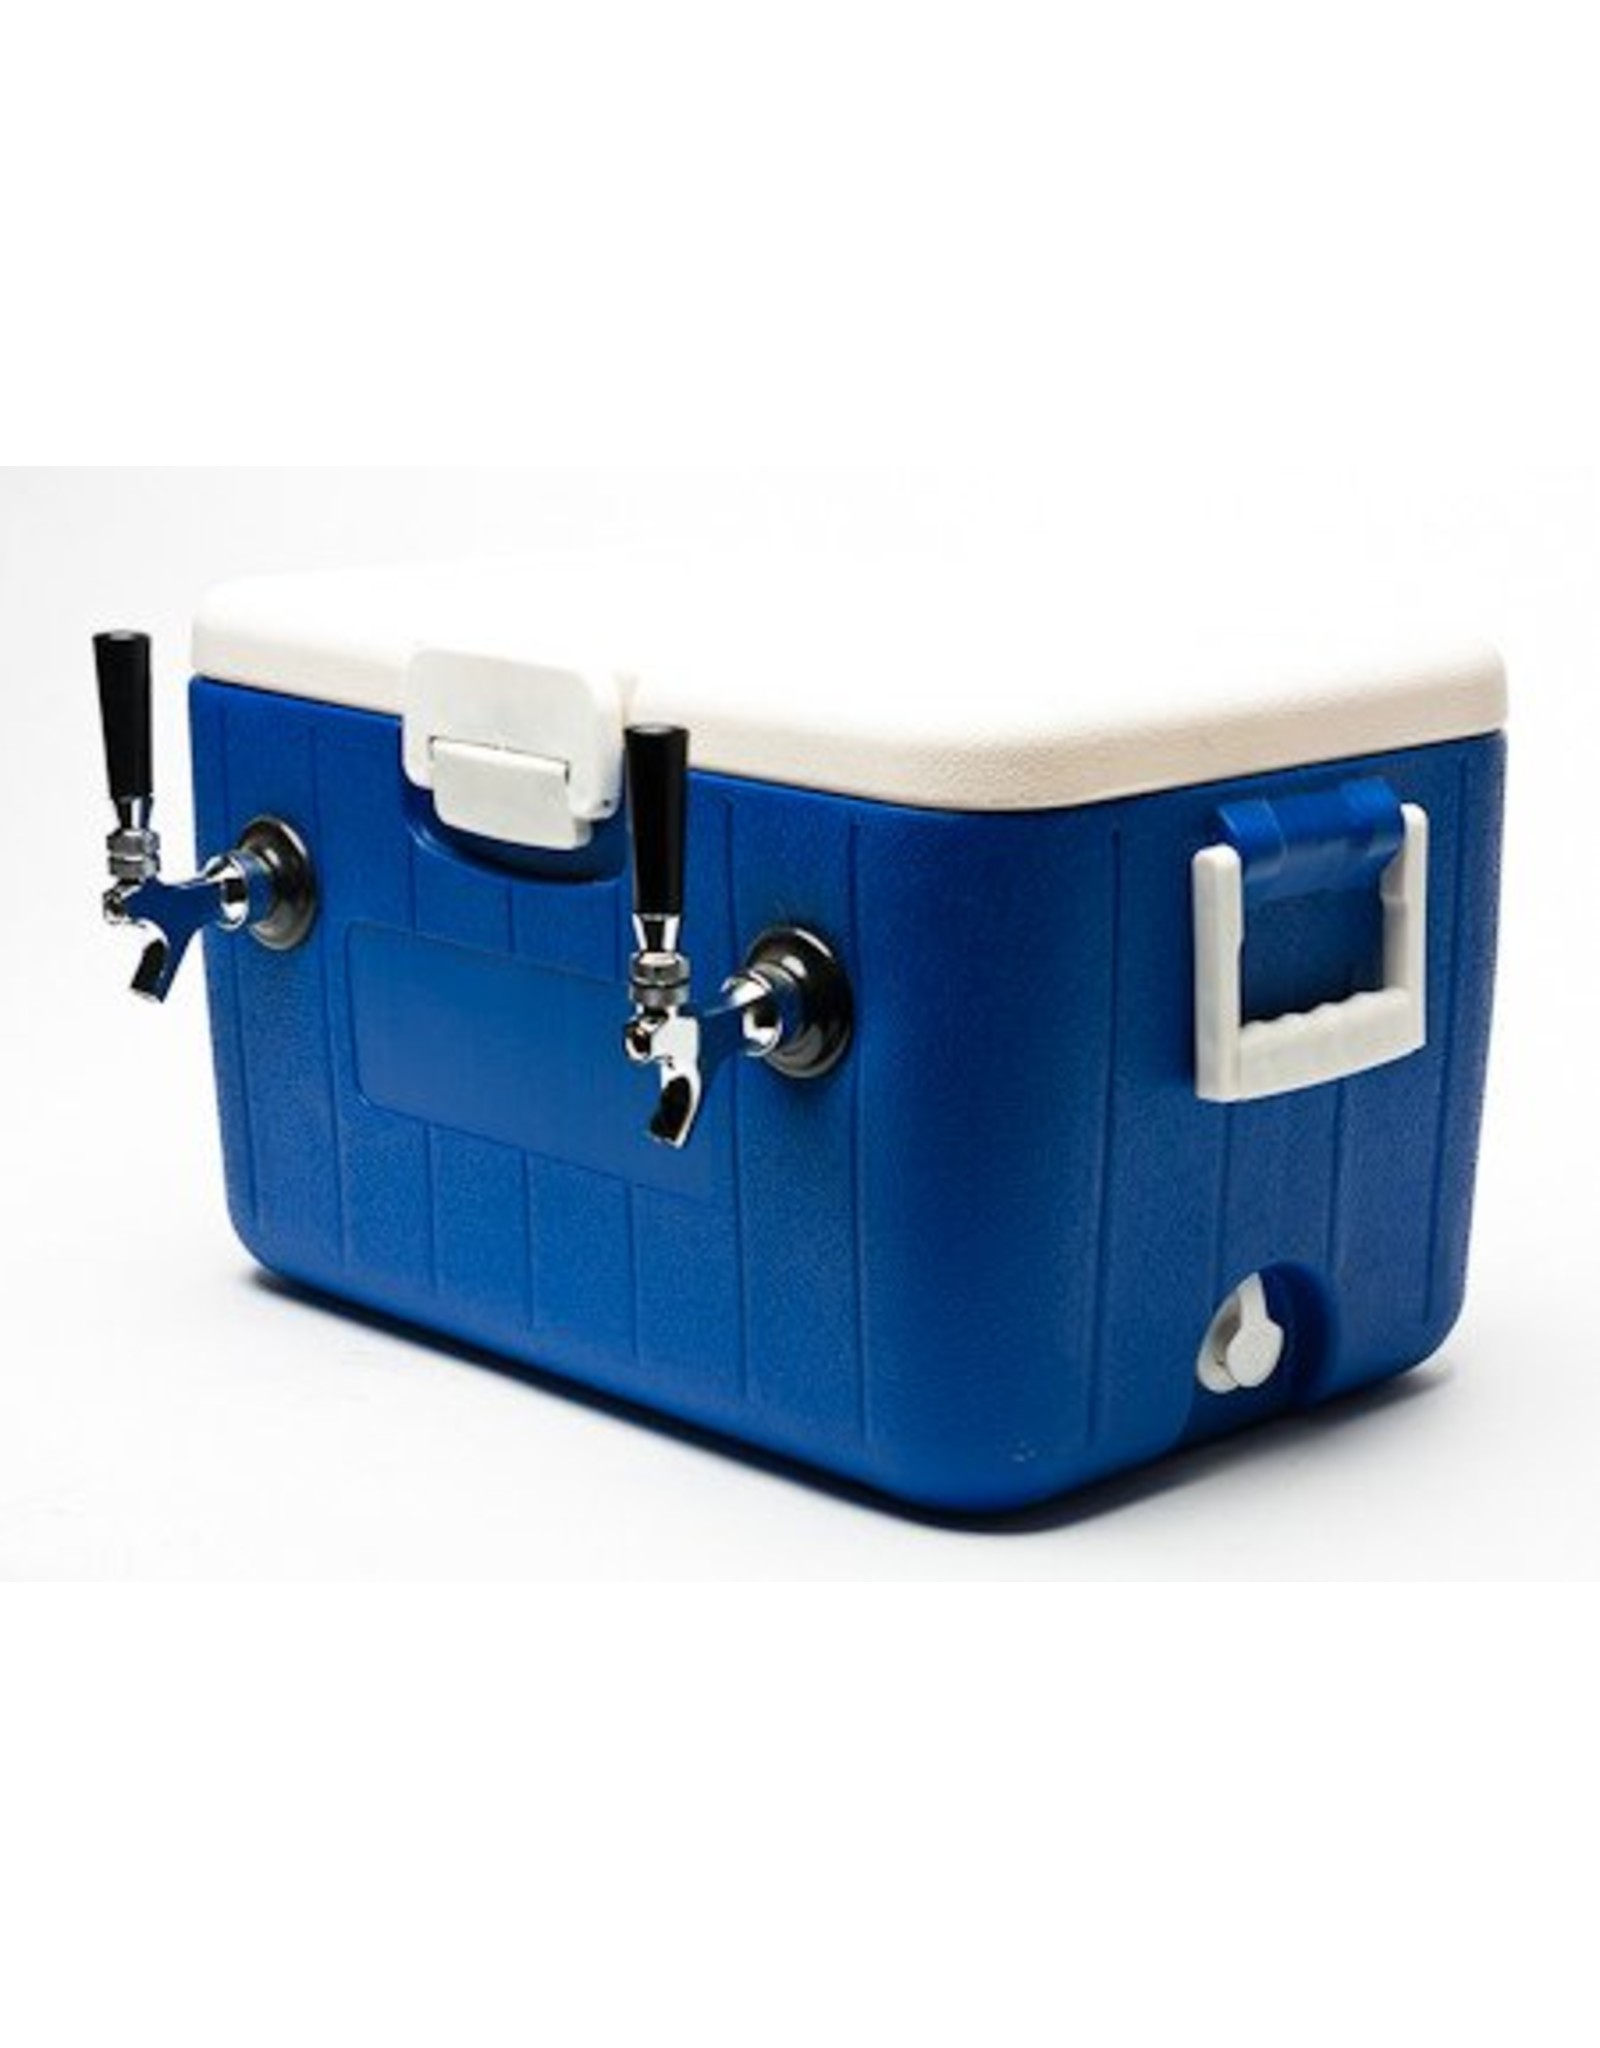 PHO 2 Tap Jockey Box Rental Deposit (NO DEBIT)